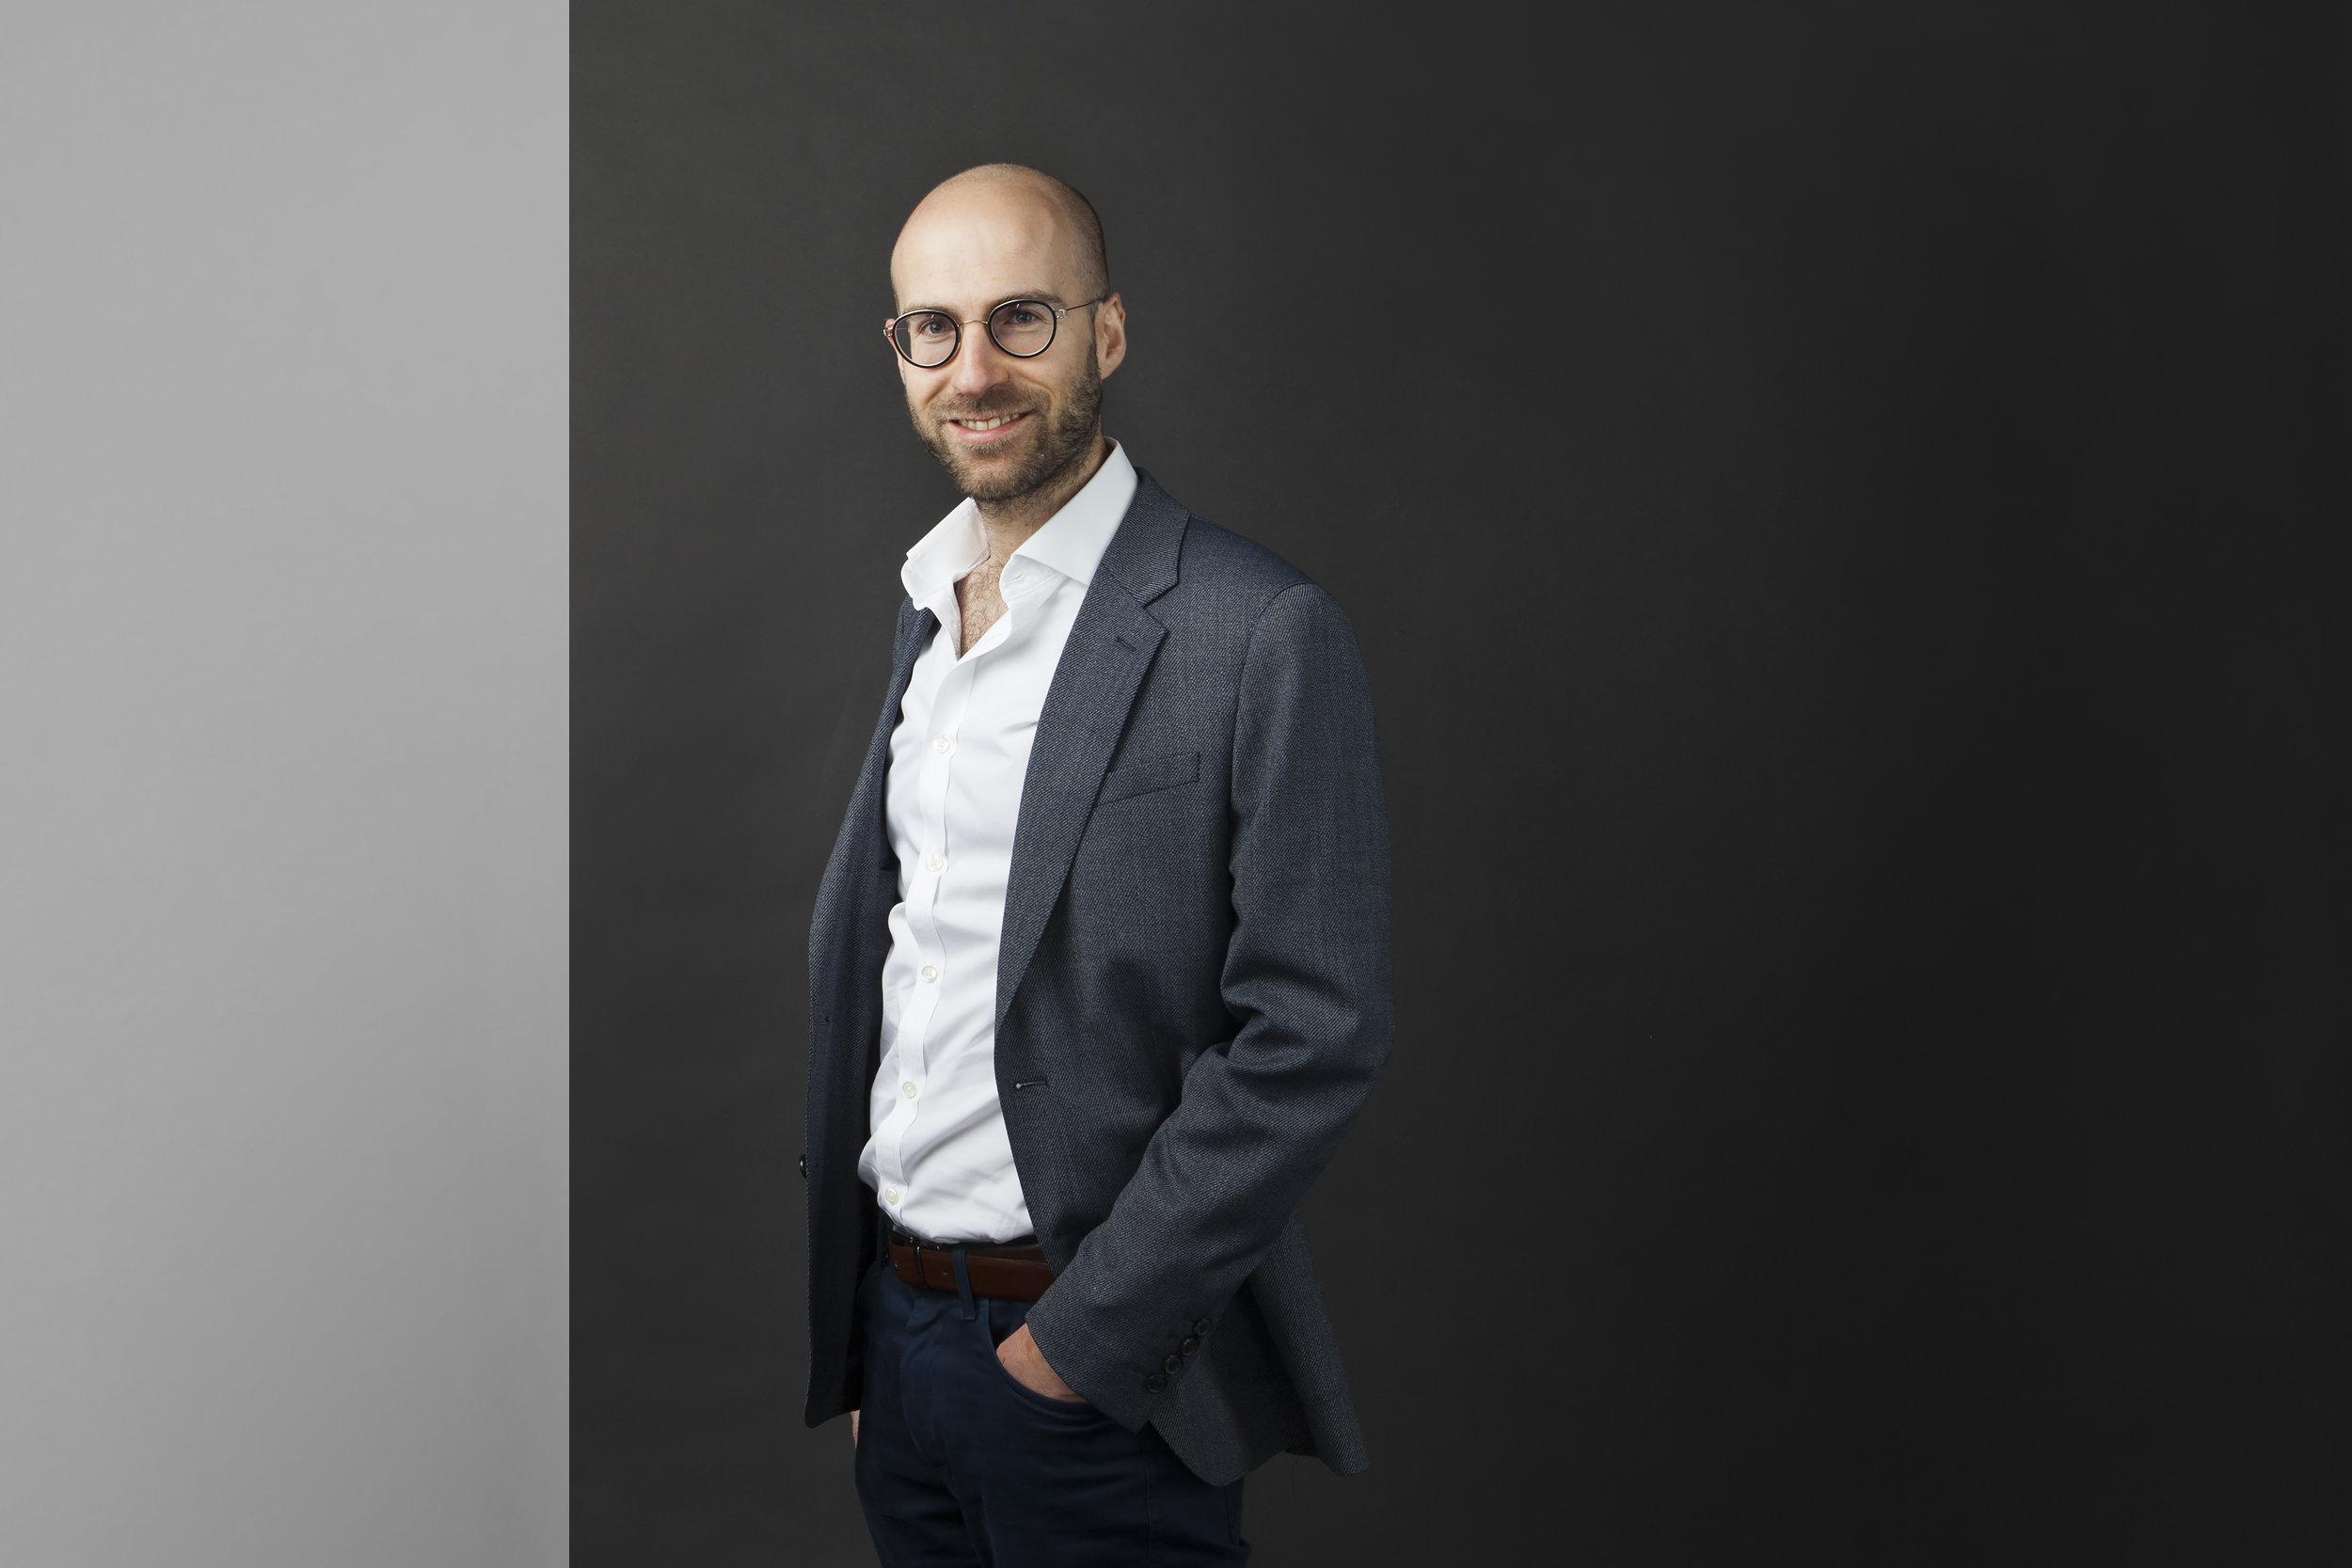 Nick Gainsley - Principal at OneVentures, leading Australian Venture Capital firm